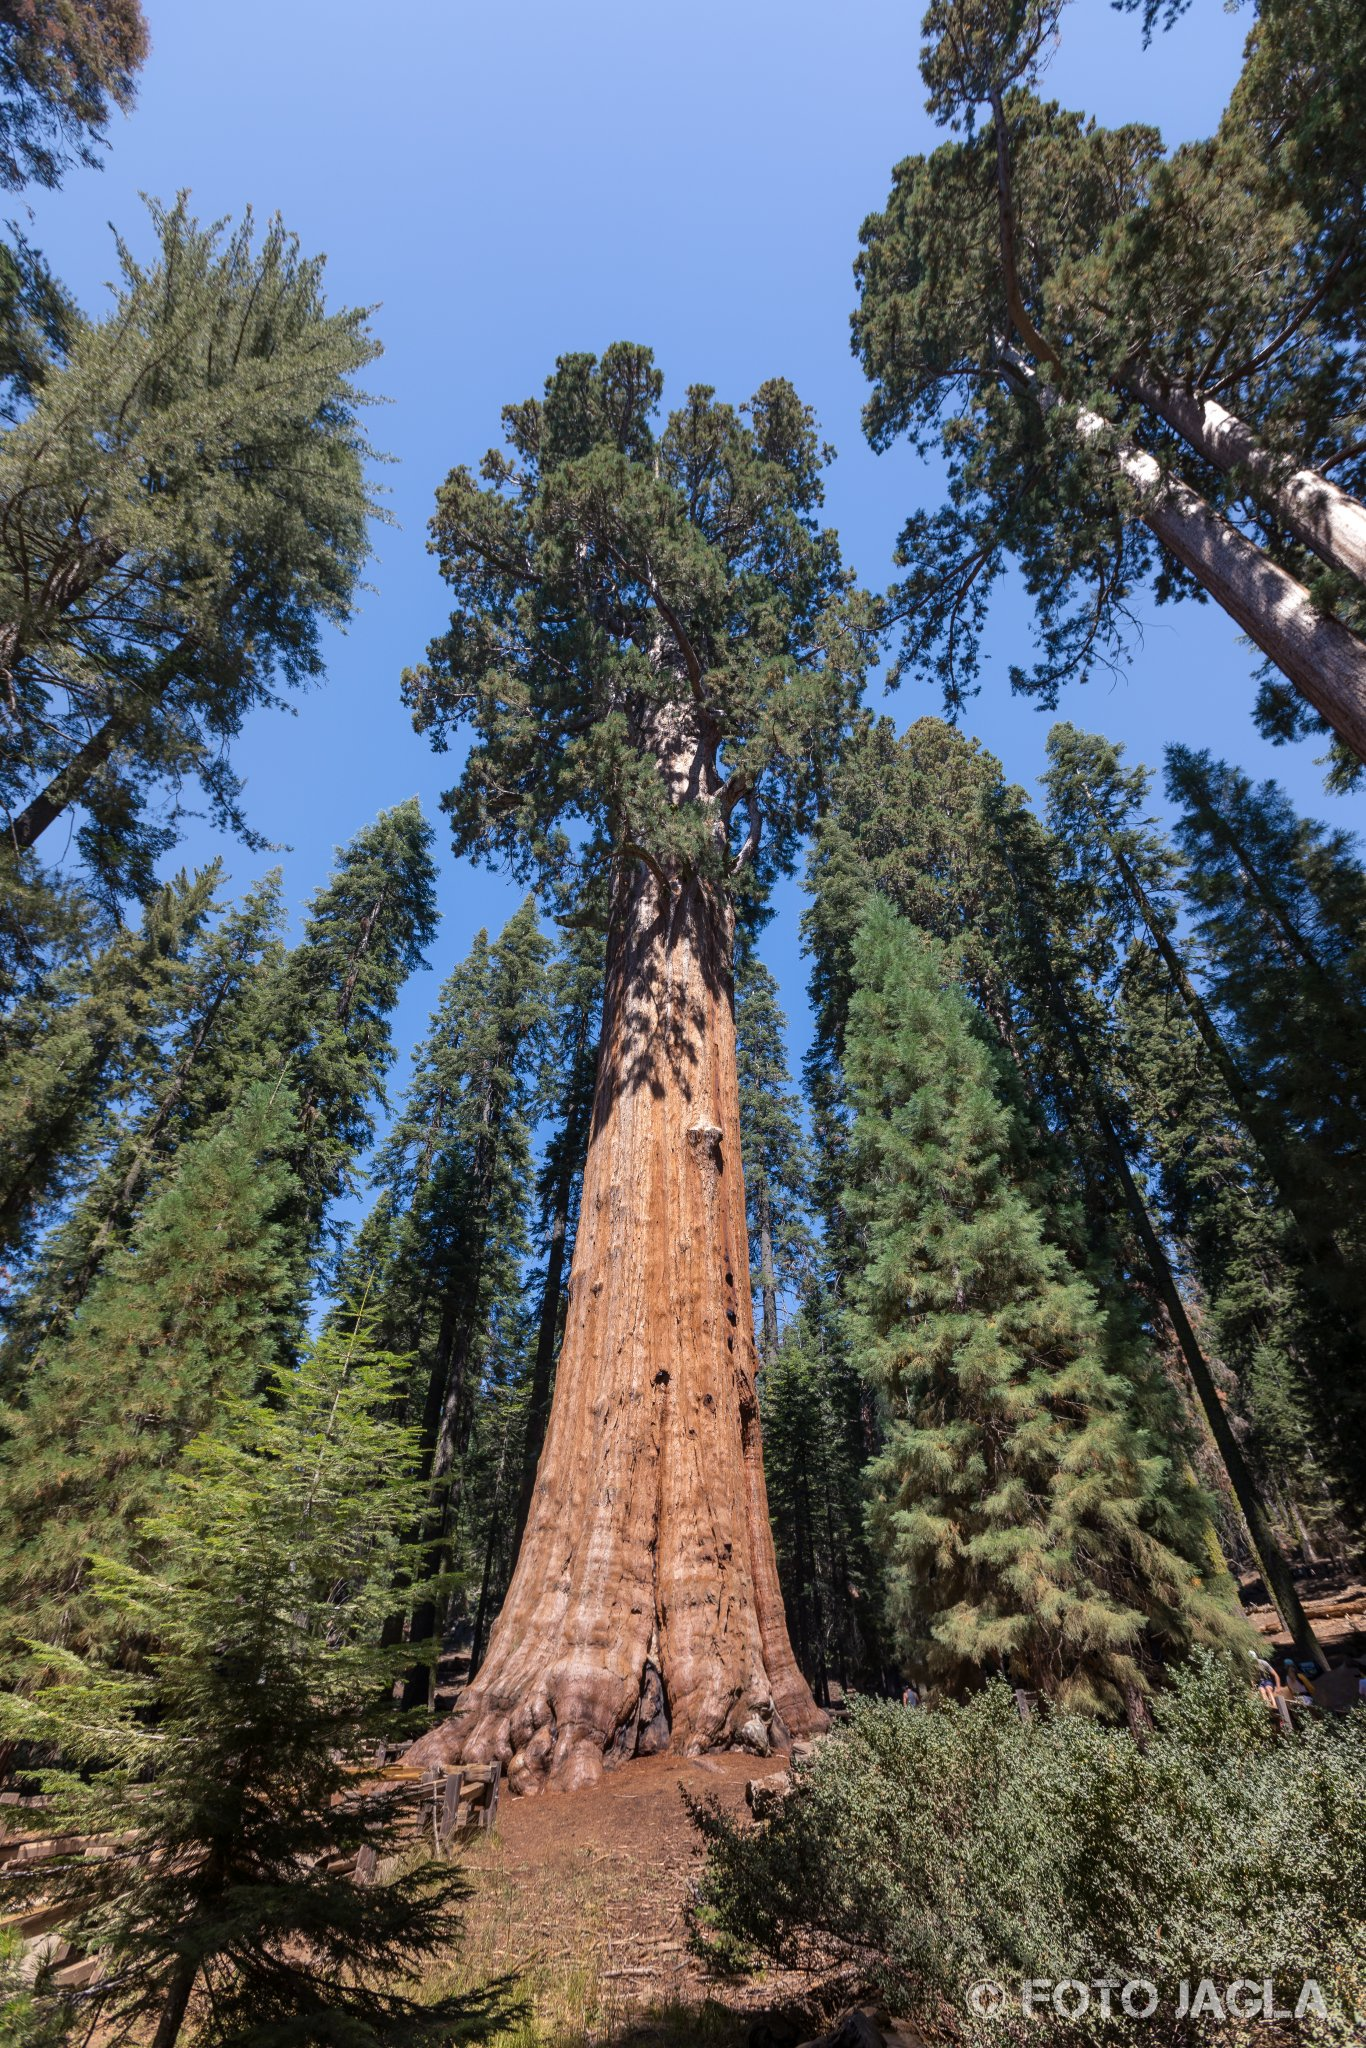 Kalifornien - September 2018 General Sherman Tree - Der voluminöseste lebende Baum der Erde Sequoia National Park - Tulare Country